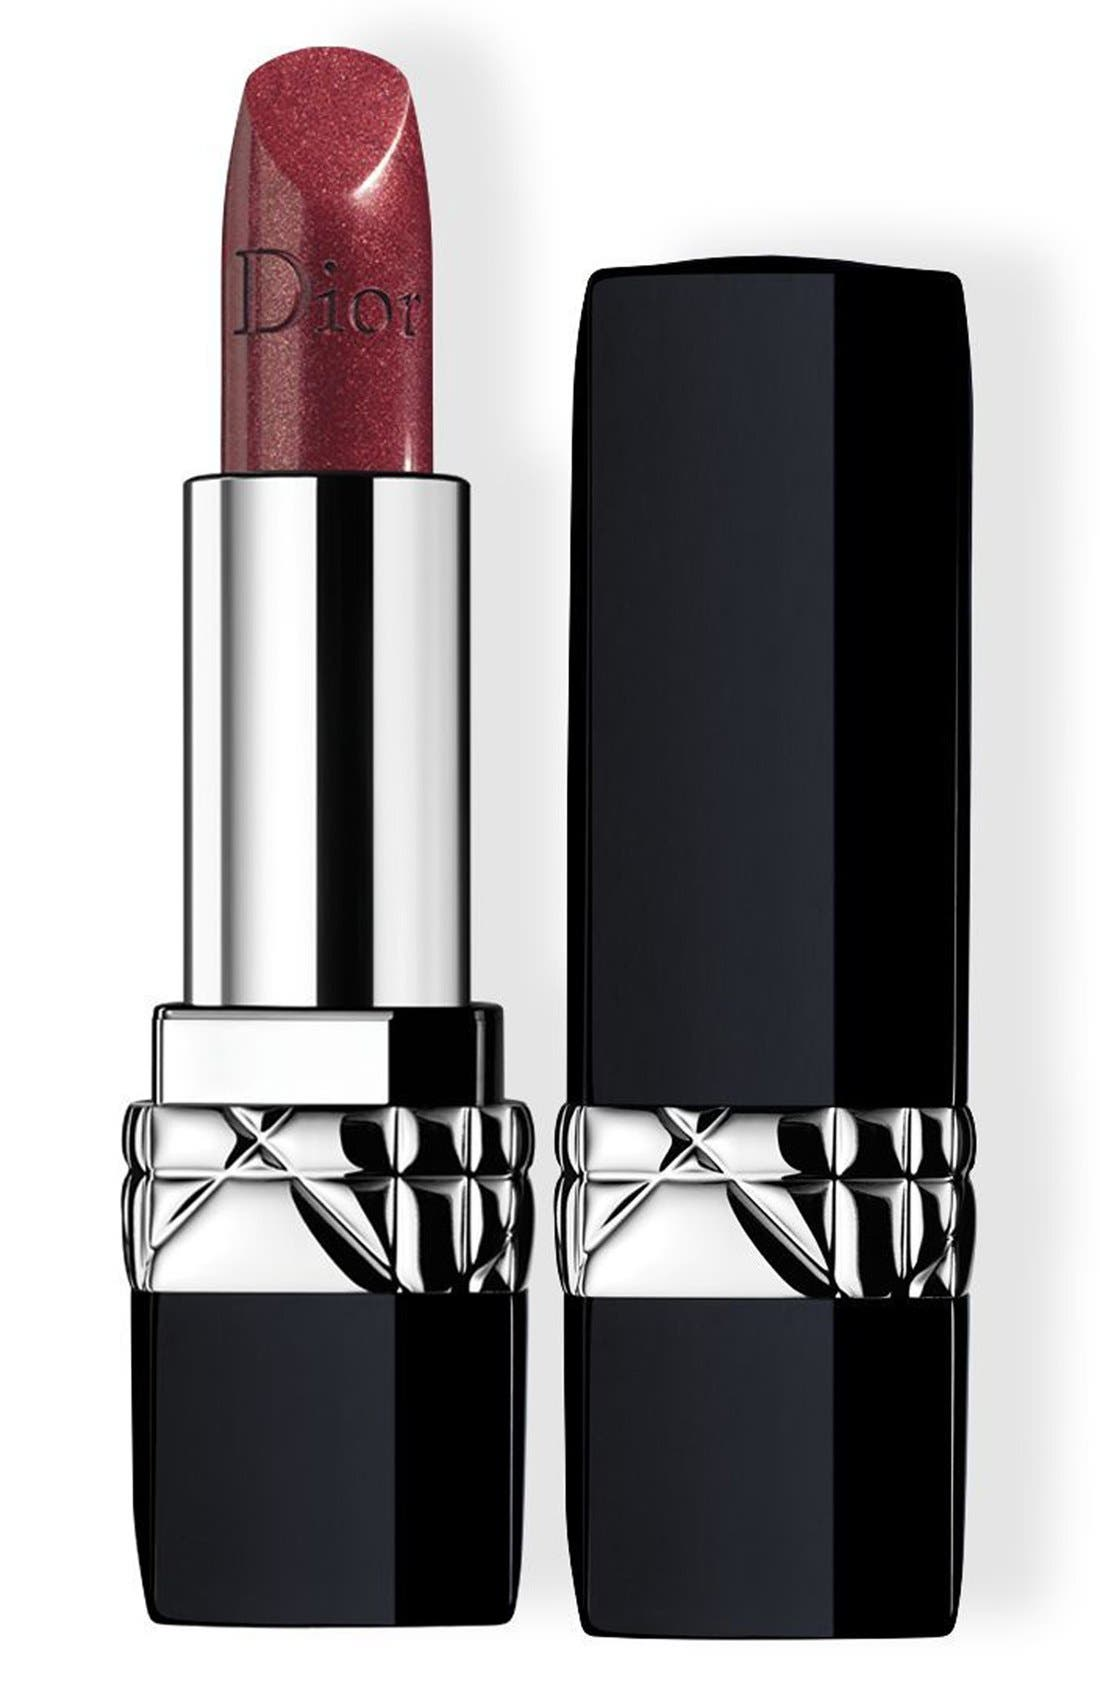 Dior Couture Color Rouge Dior Lipstick - 976 Daisy Plum